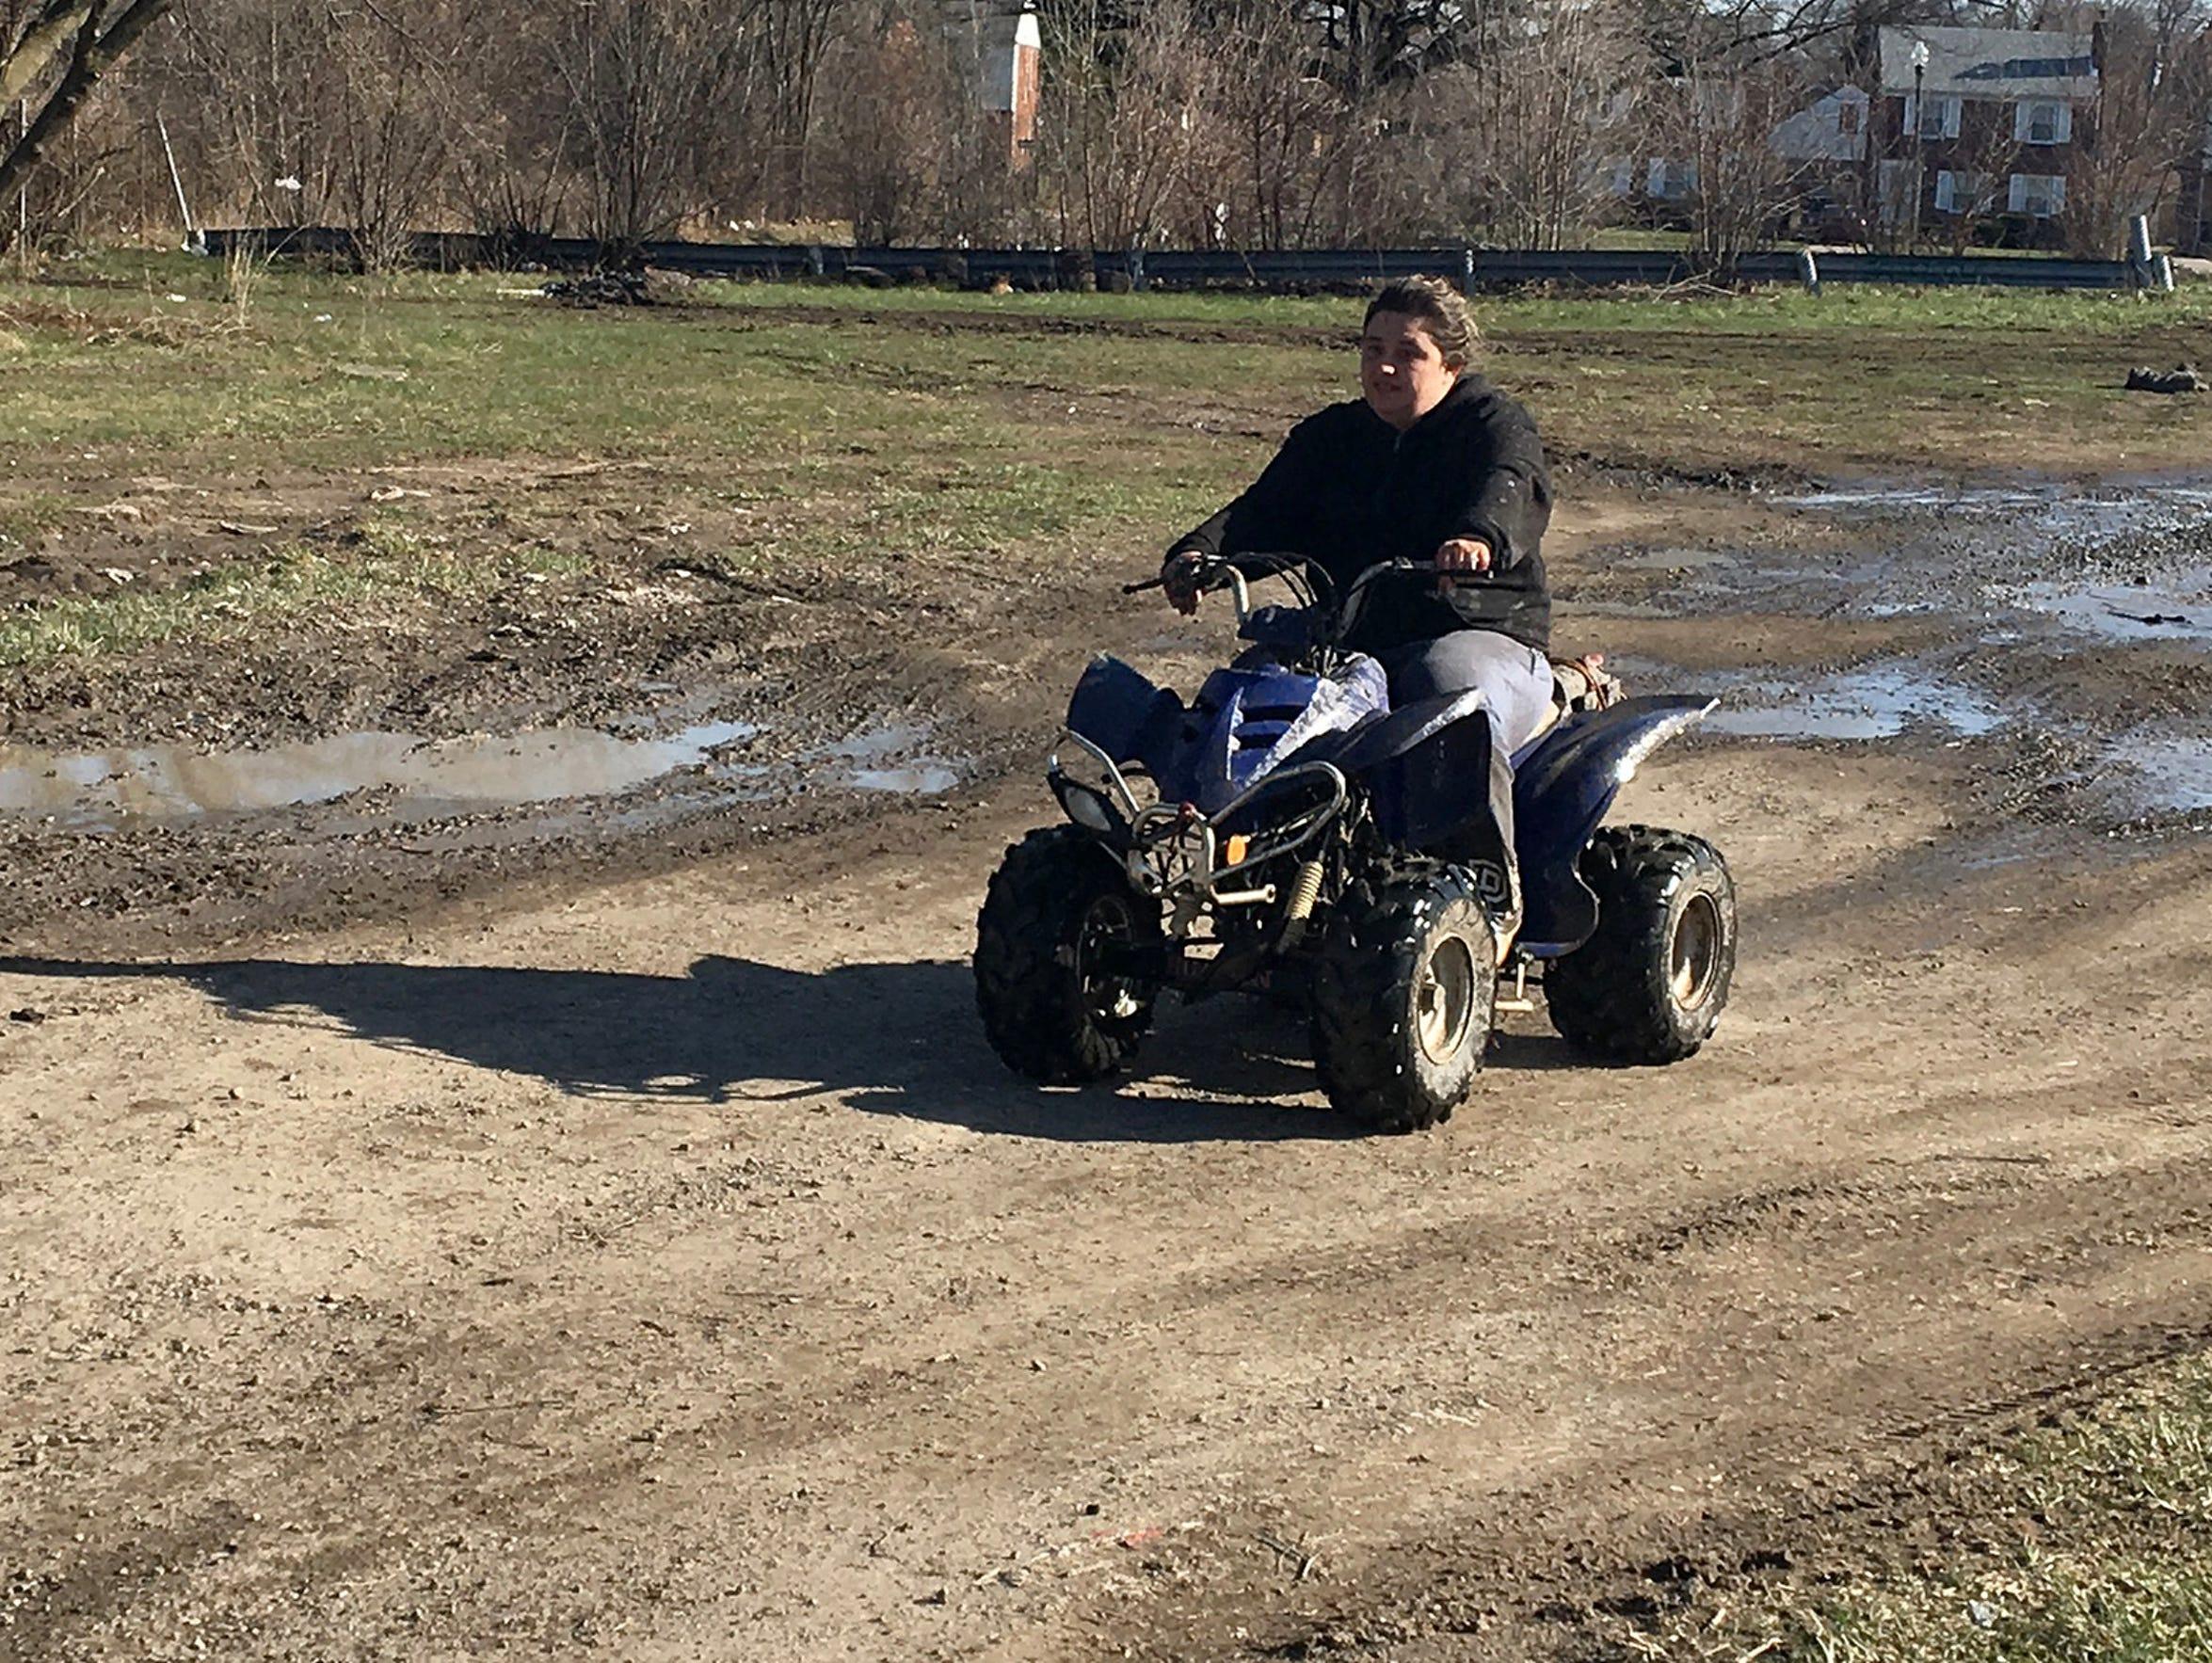 Jenna Blackburn, 31, of Warren rides her ATV at Dorais